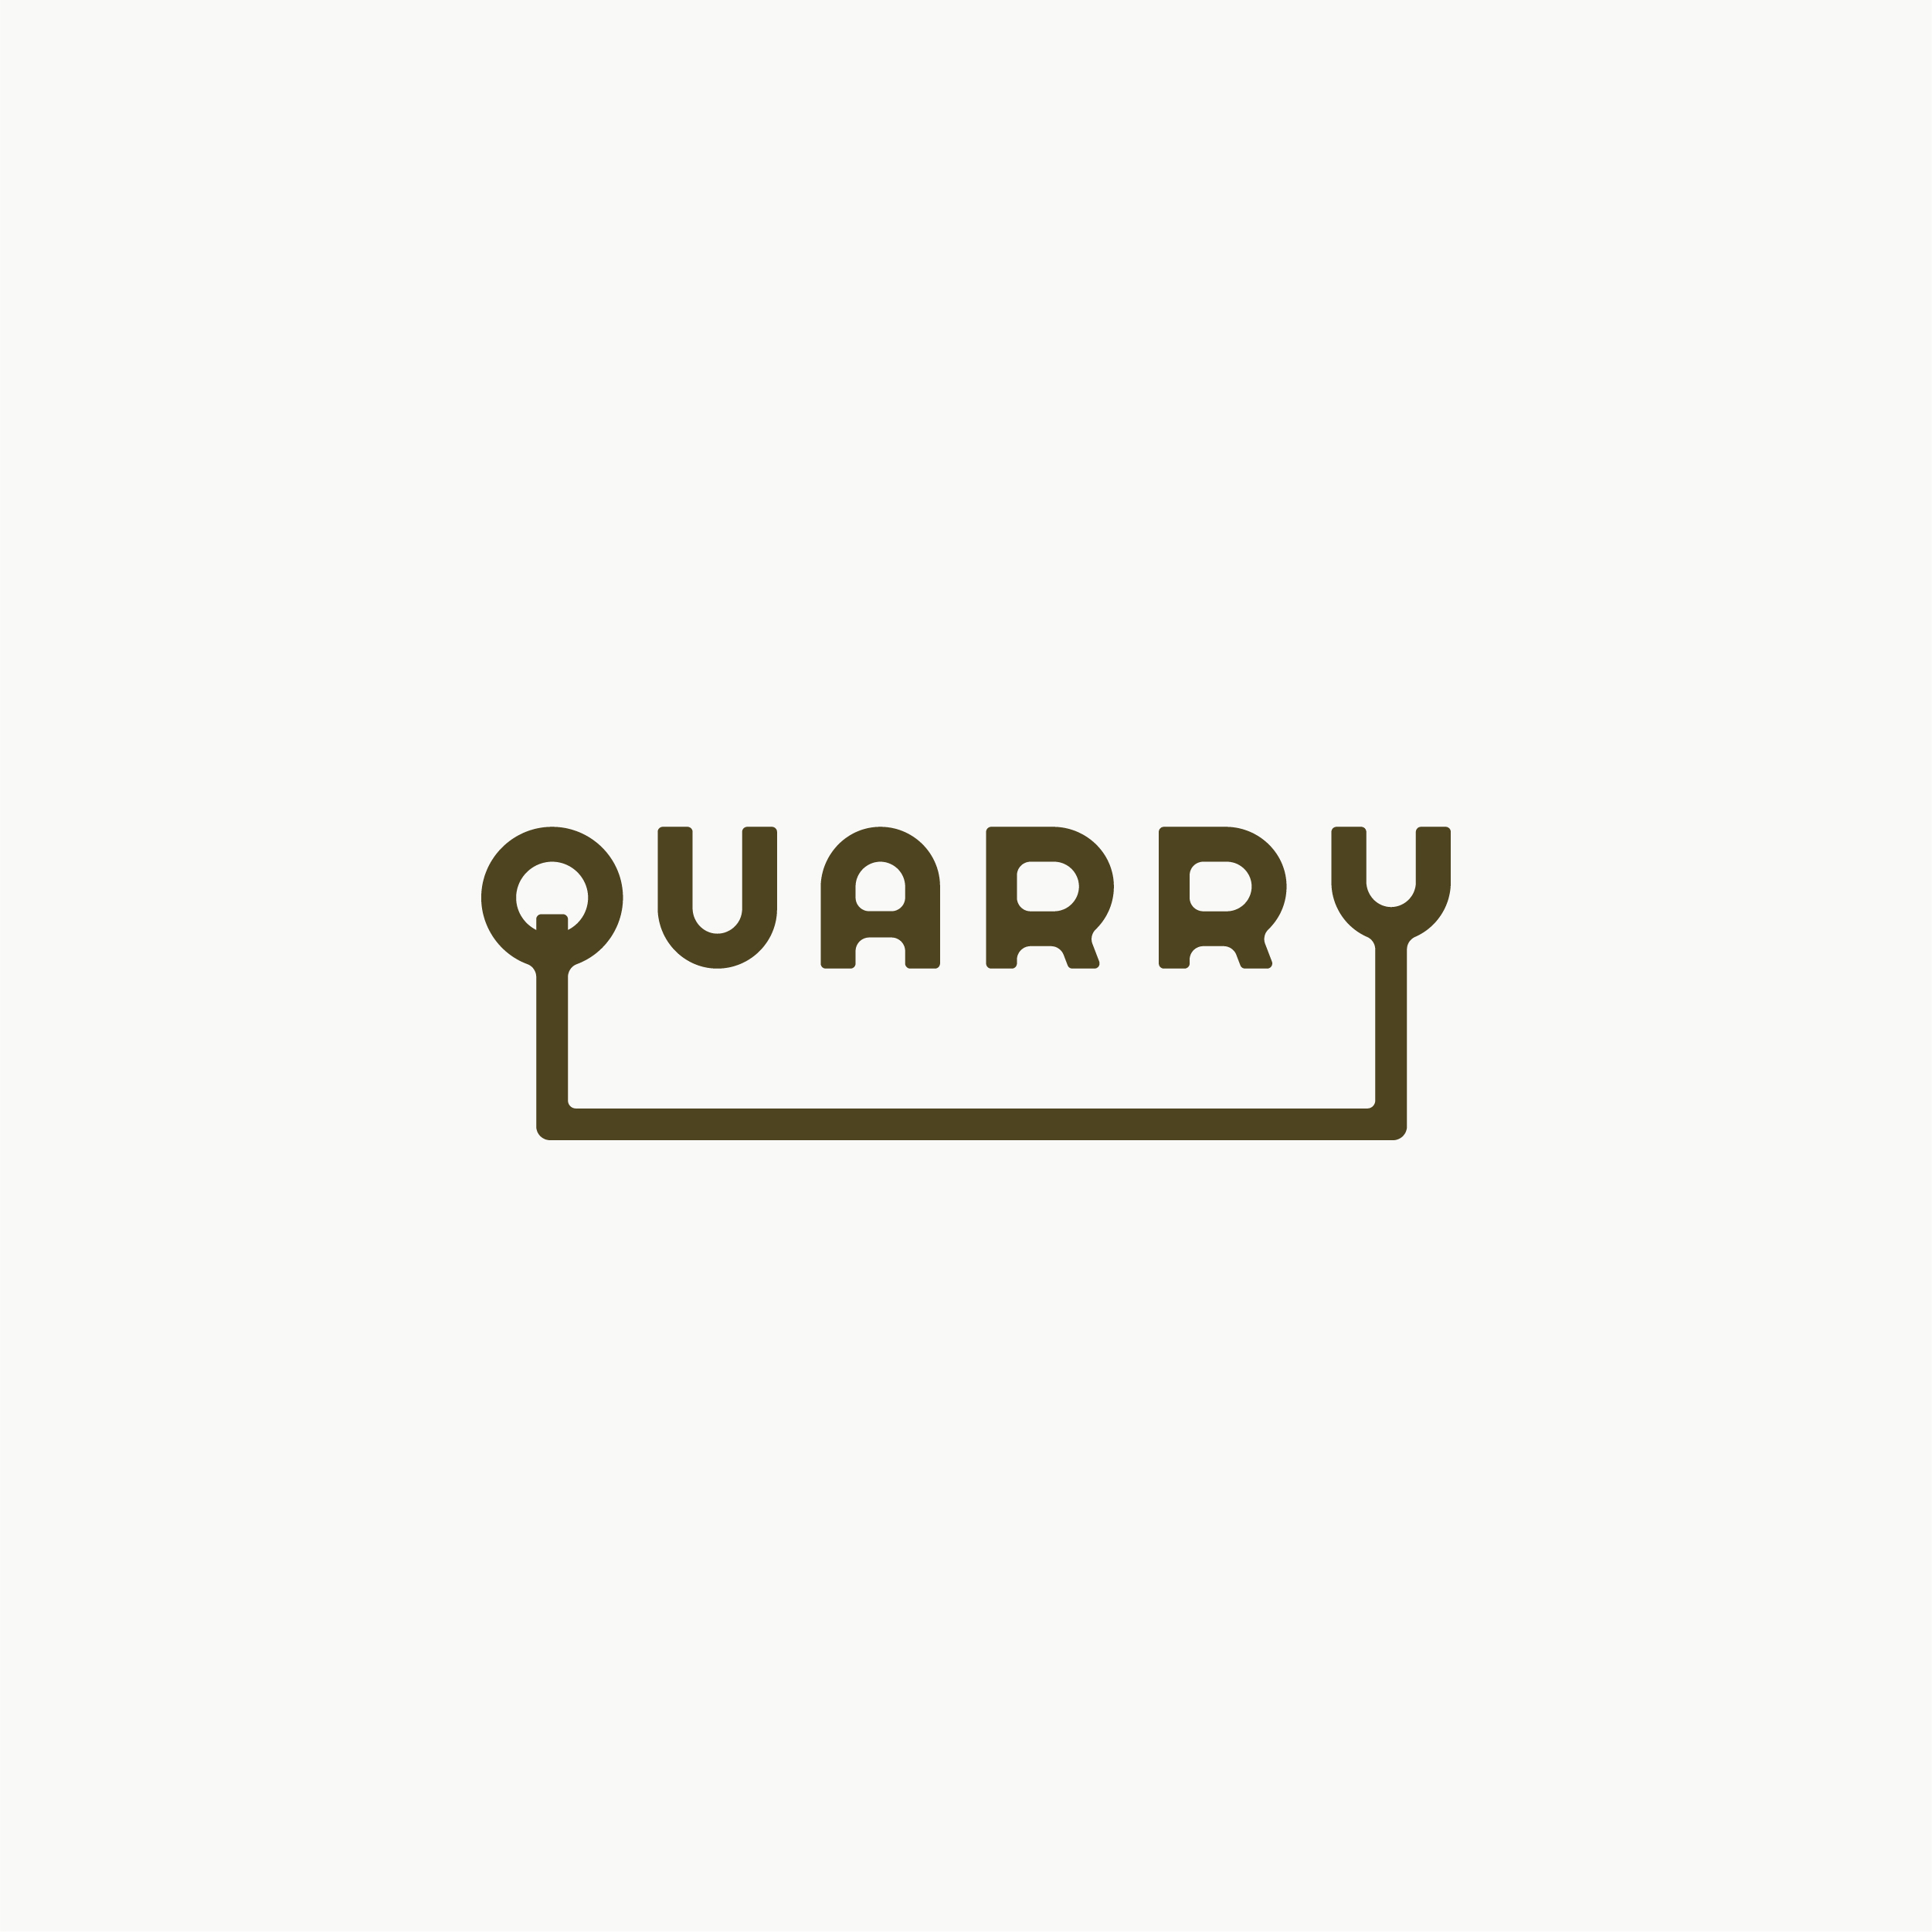 TBS_LogosMarks_Quarry